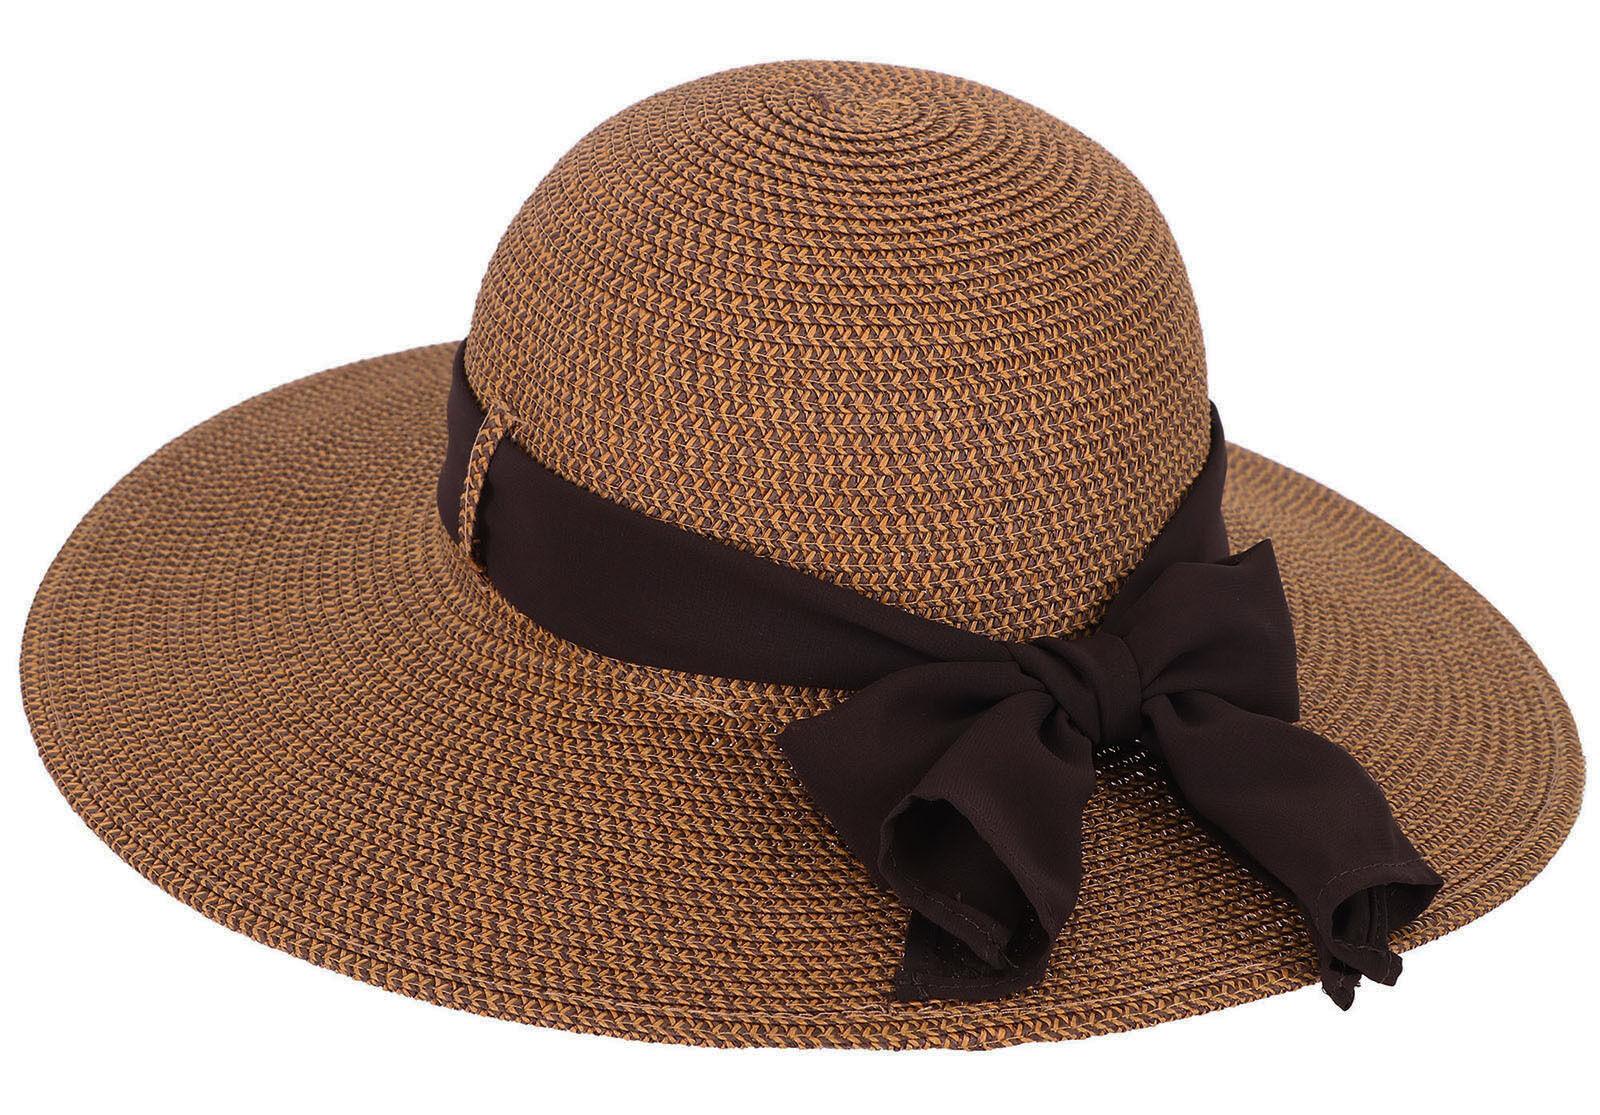 Summer Straw Hats Chiffon Ribbon Ladies Gardening Outdoor Beach Sun ...